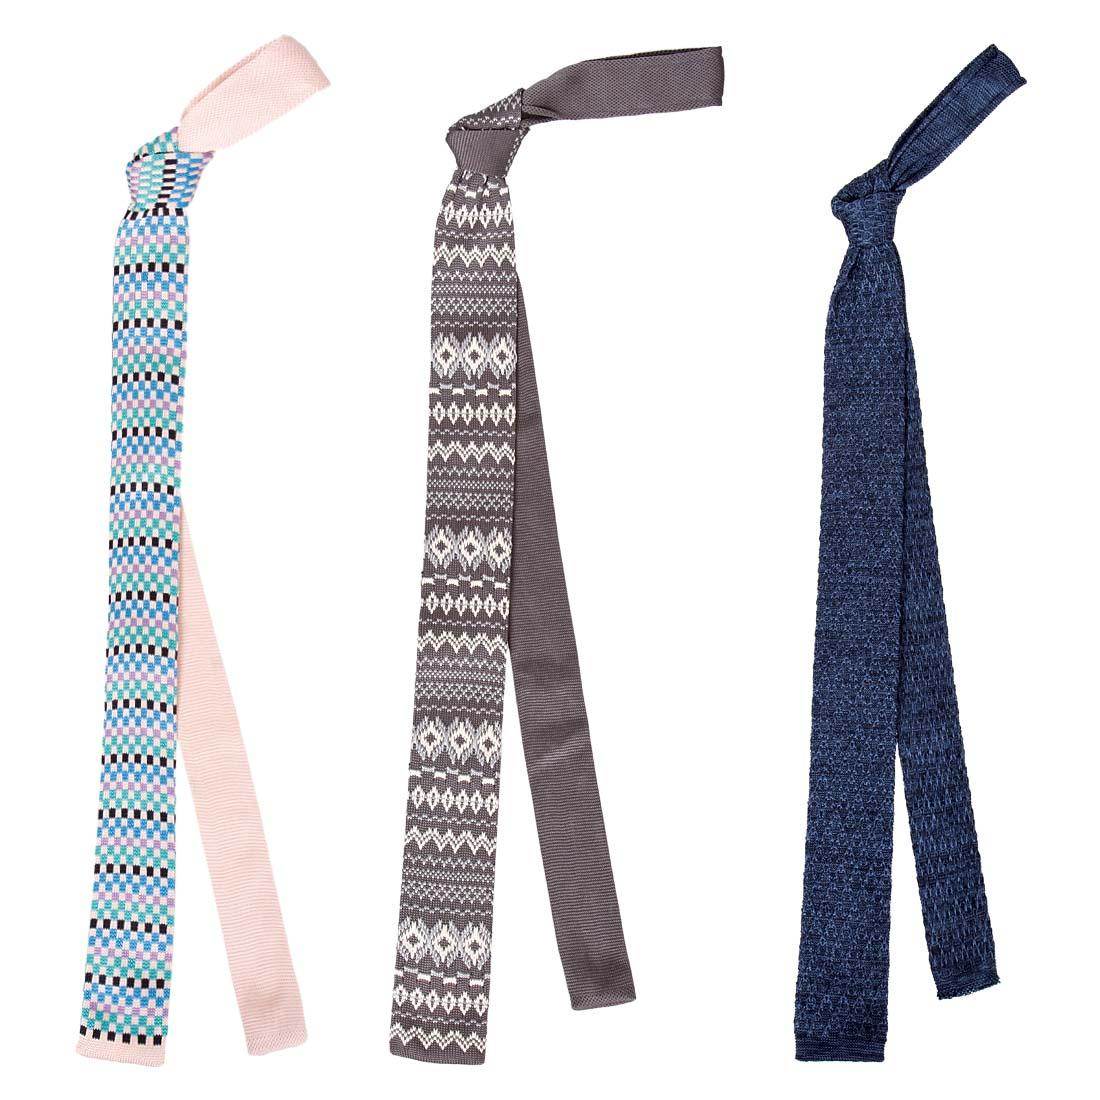 BMC Stylish 3pc Mixed Pattern Mens Fashion Knitted Neck Tie Accessory Set eBay